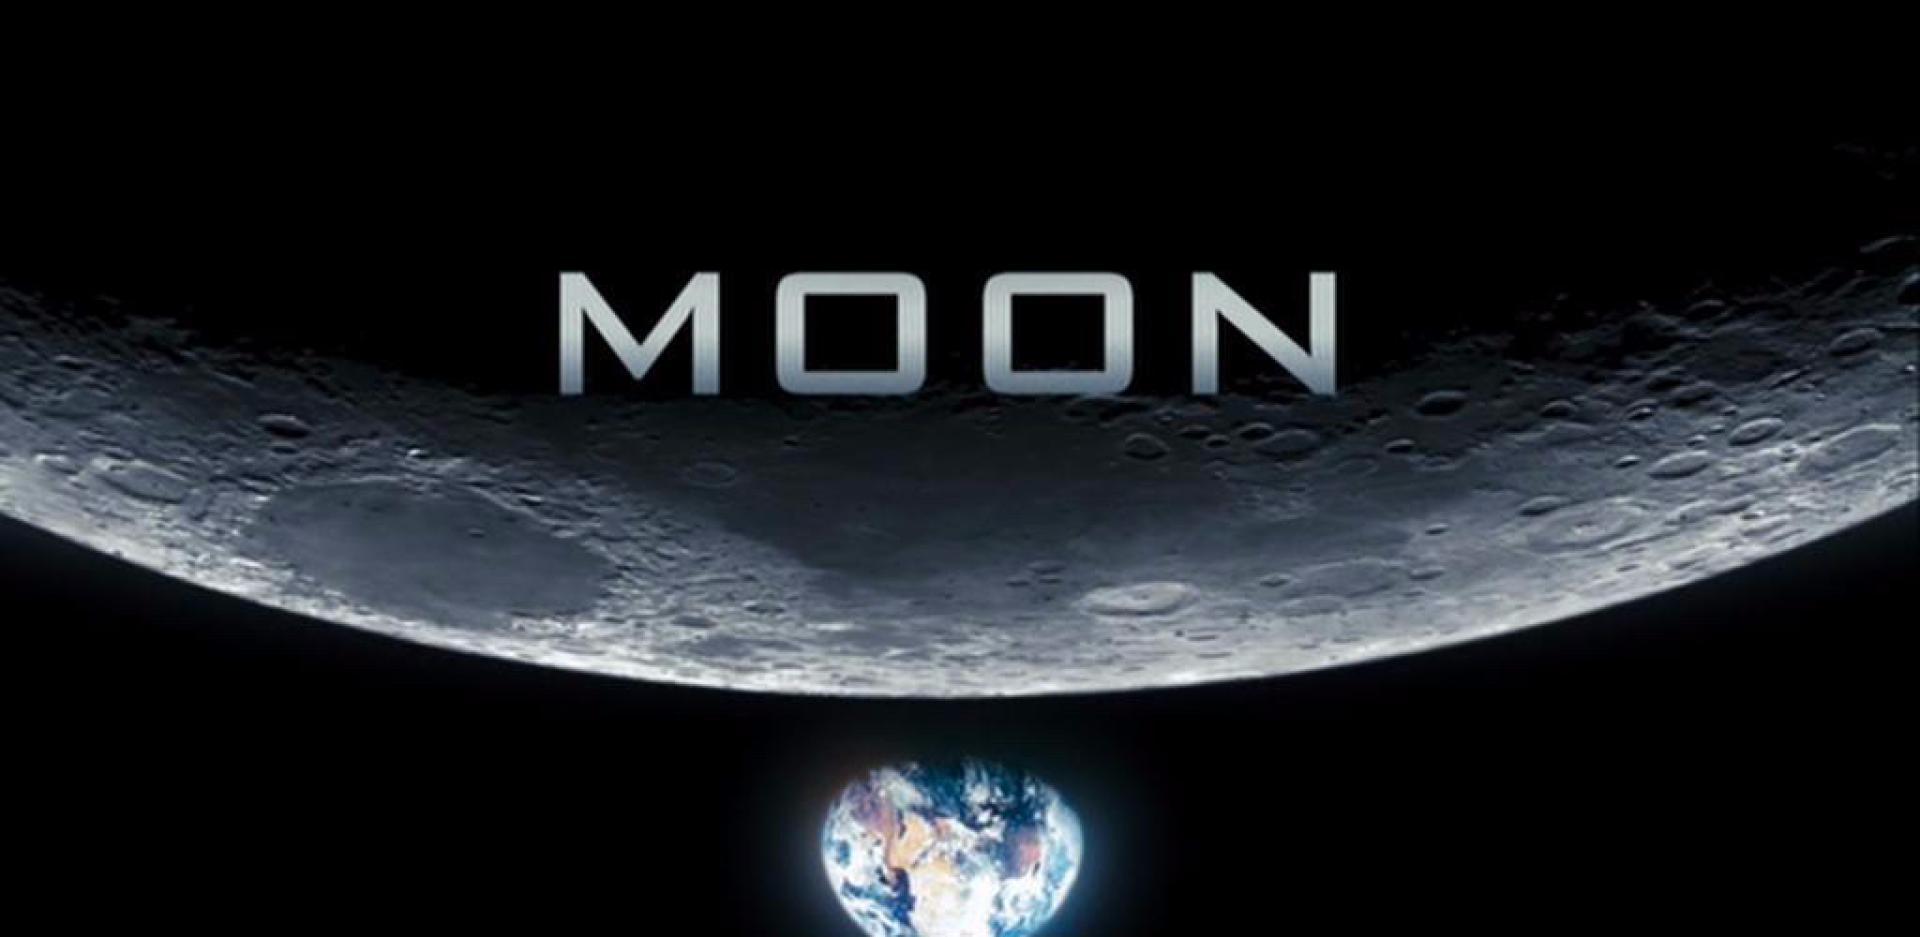 Moon – Hold (2009)